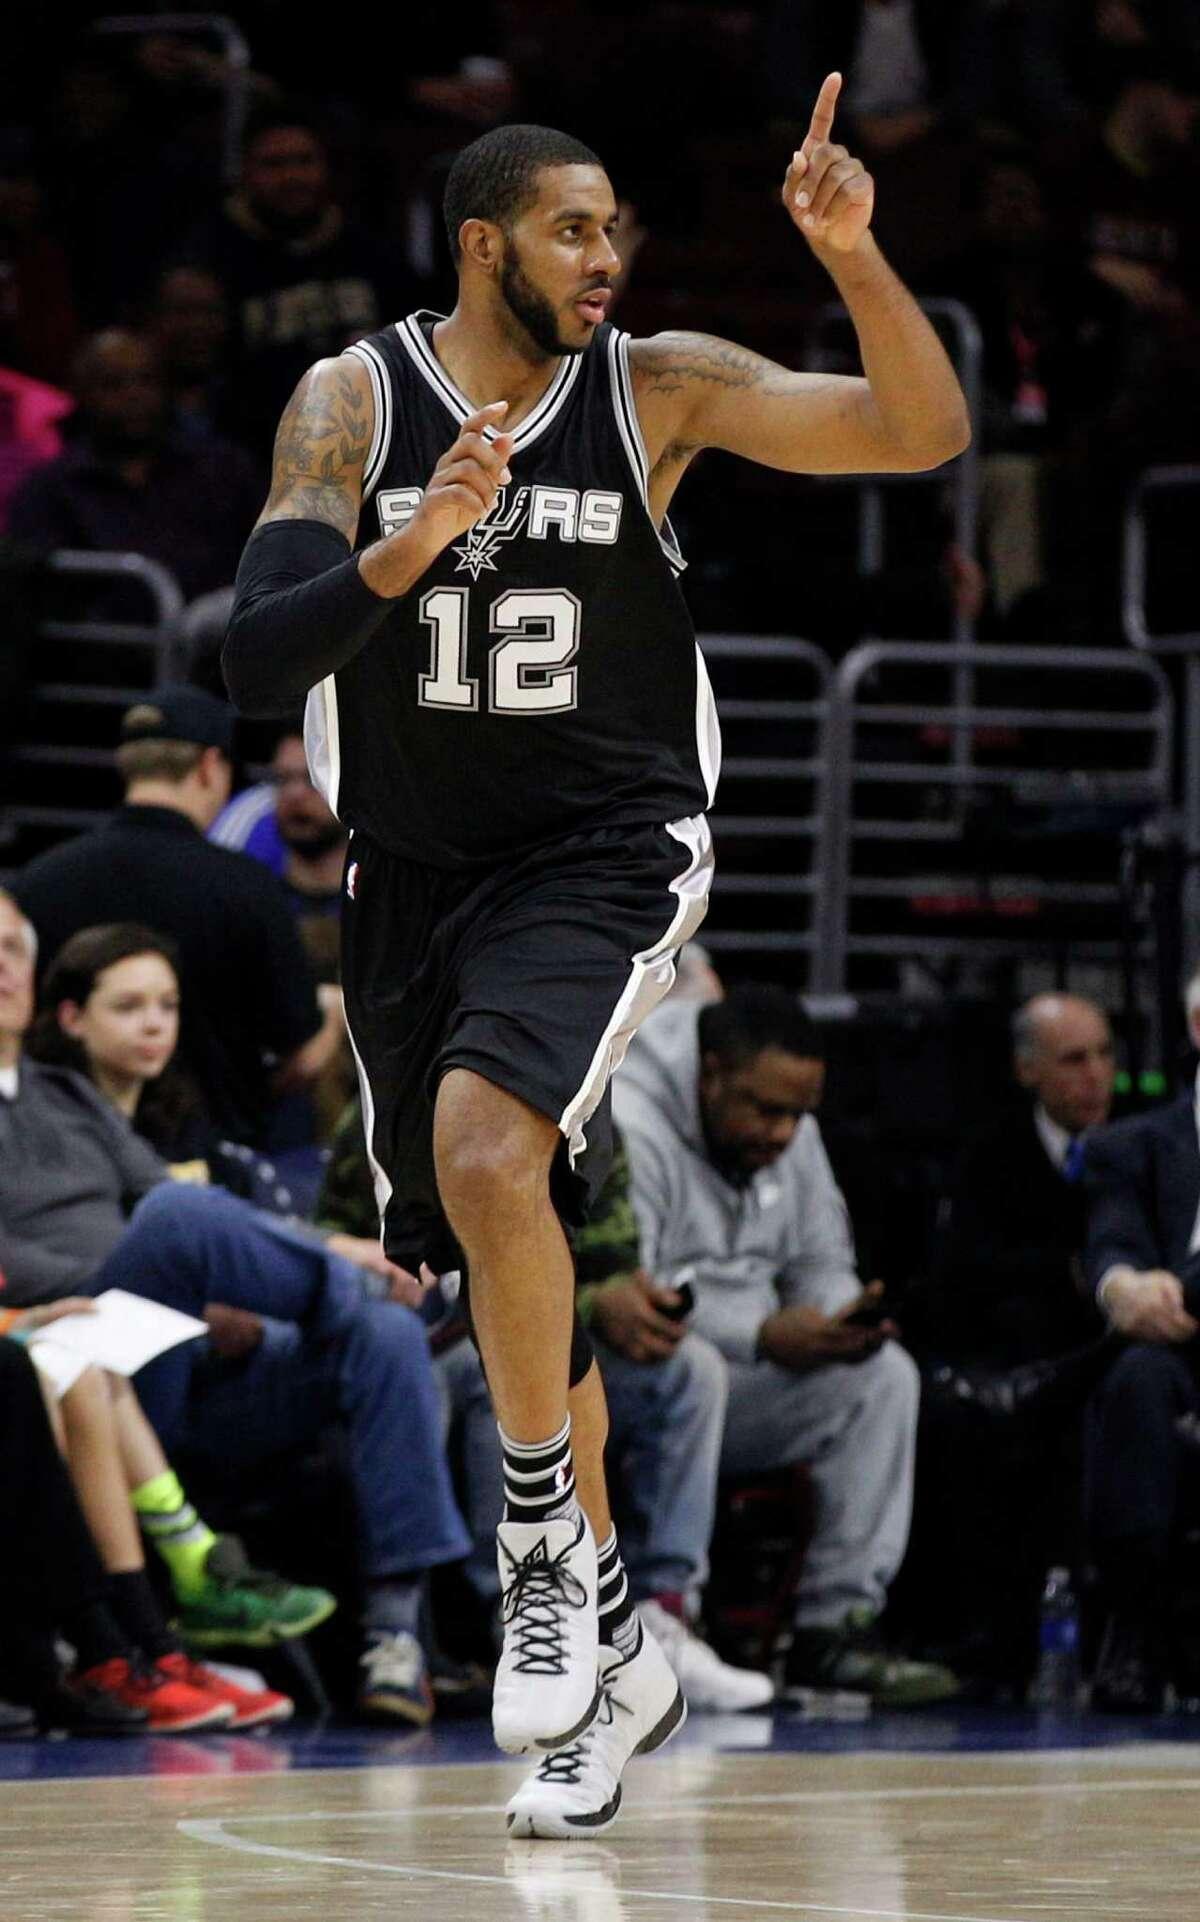 San Antonio Spurs' LaMarcus Aldridge reacts to his basket during the first half of an NBA basketball game against the Philadelphia 76ers, Monday, Dec. 7, 2015, in Philadelphia. (AP Photo/Chris Szagola)